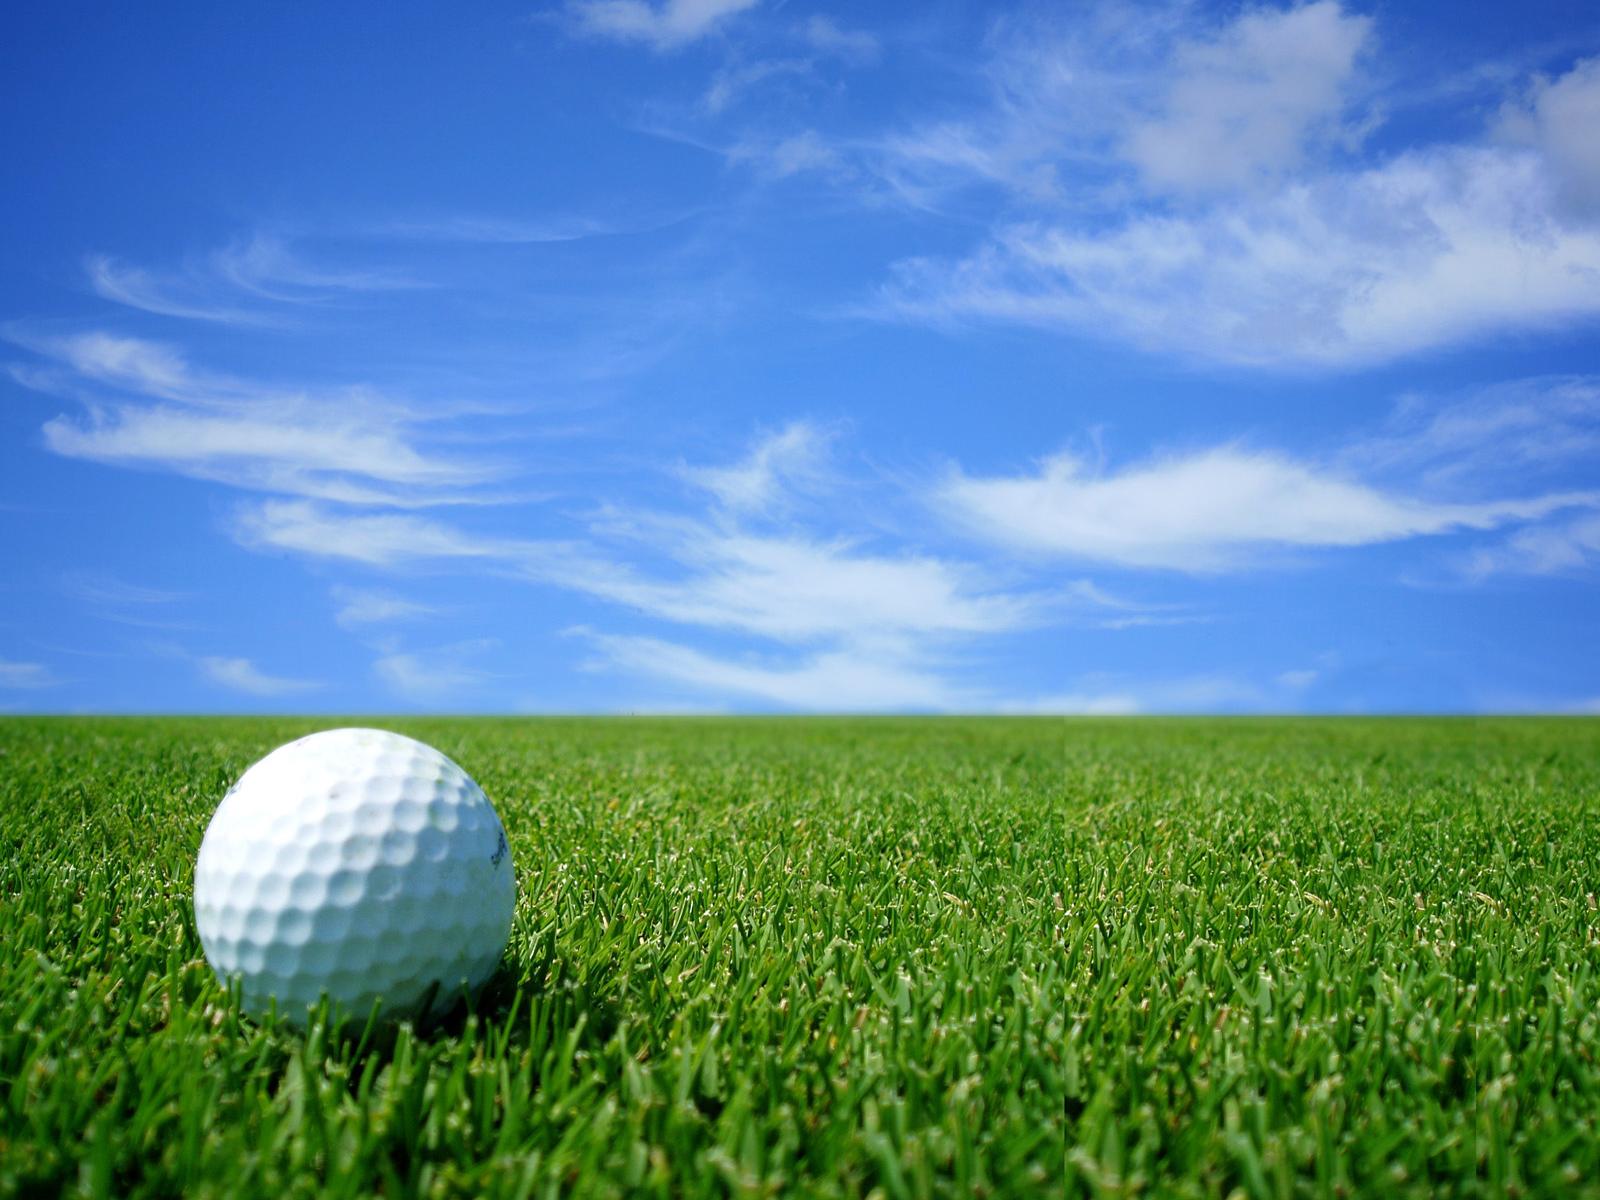 49 Free Golf Wallpaper Images On Wallpapersafari